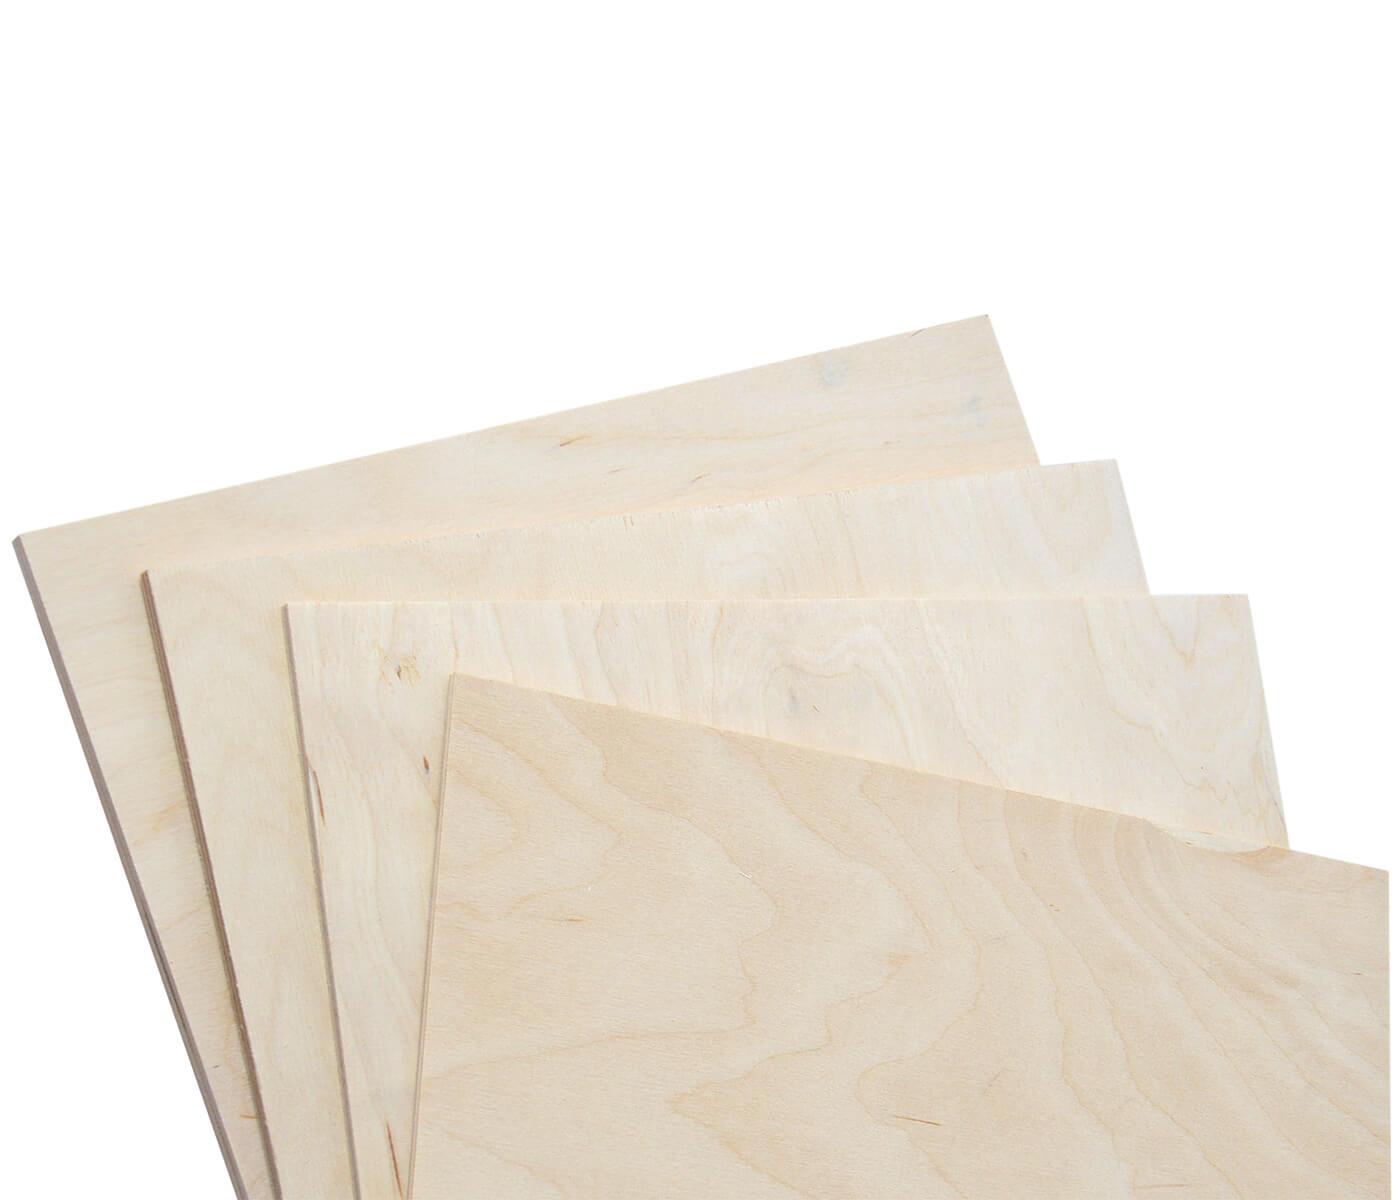 9 mm Multiplexplatte Zuschnitt Sperrholz-Platten Holz Massiv Naturfarbe unbehandelt Breite 30 cm L/änge 45 cm